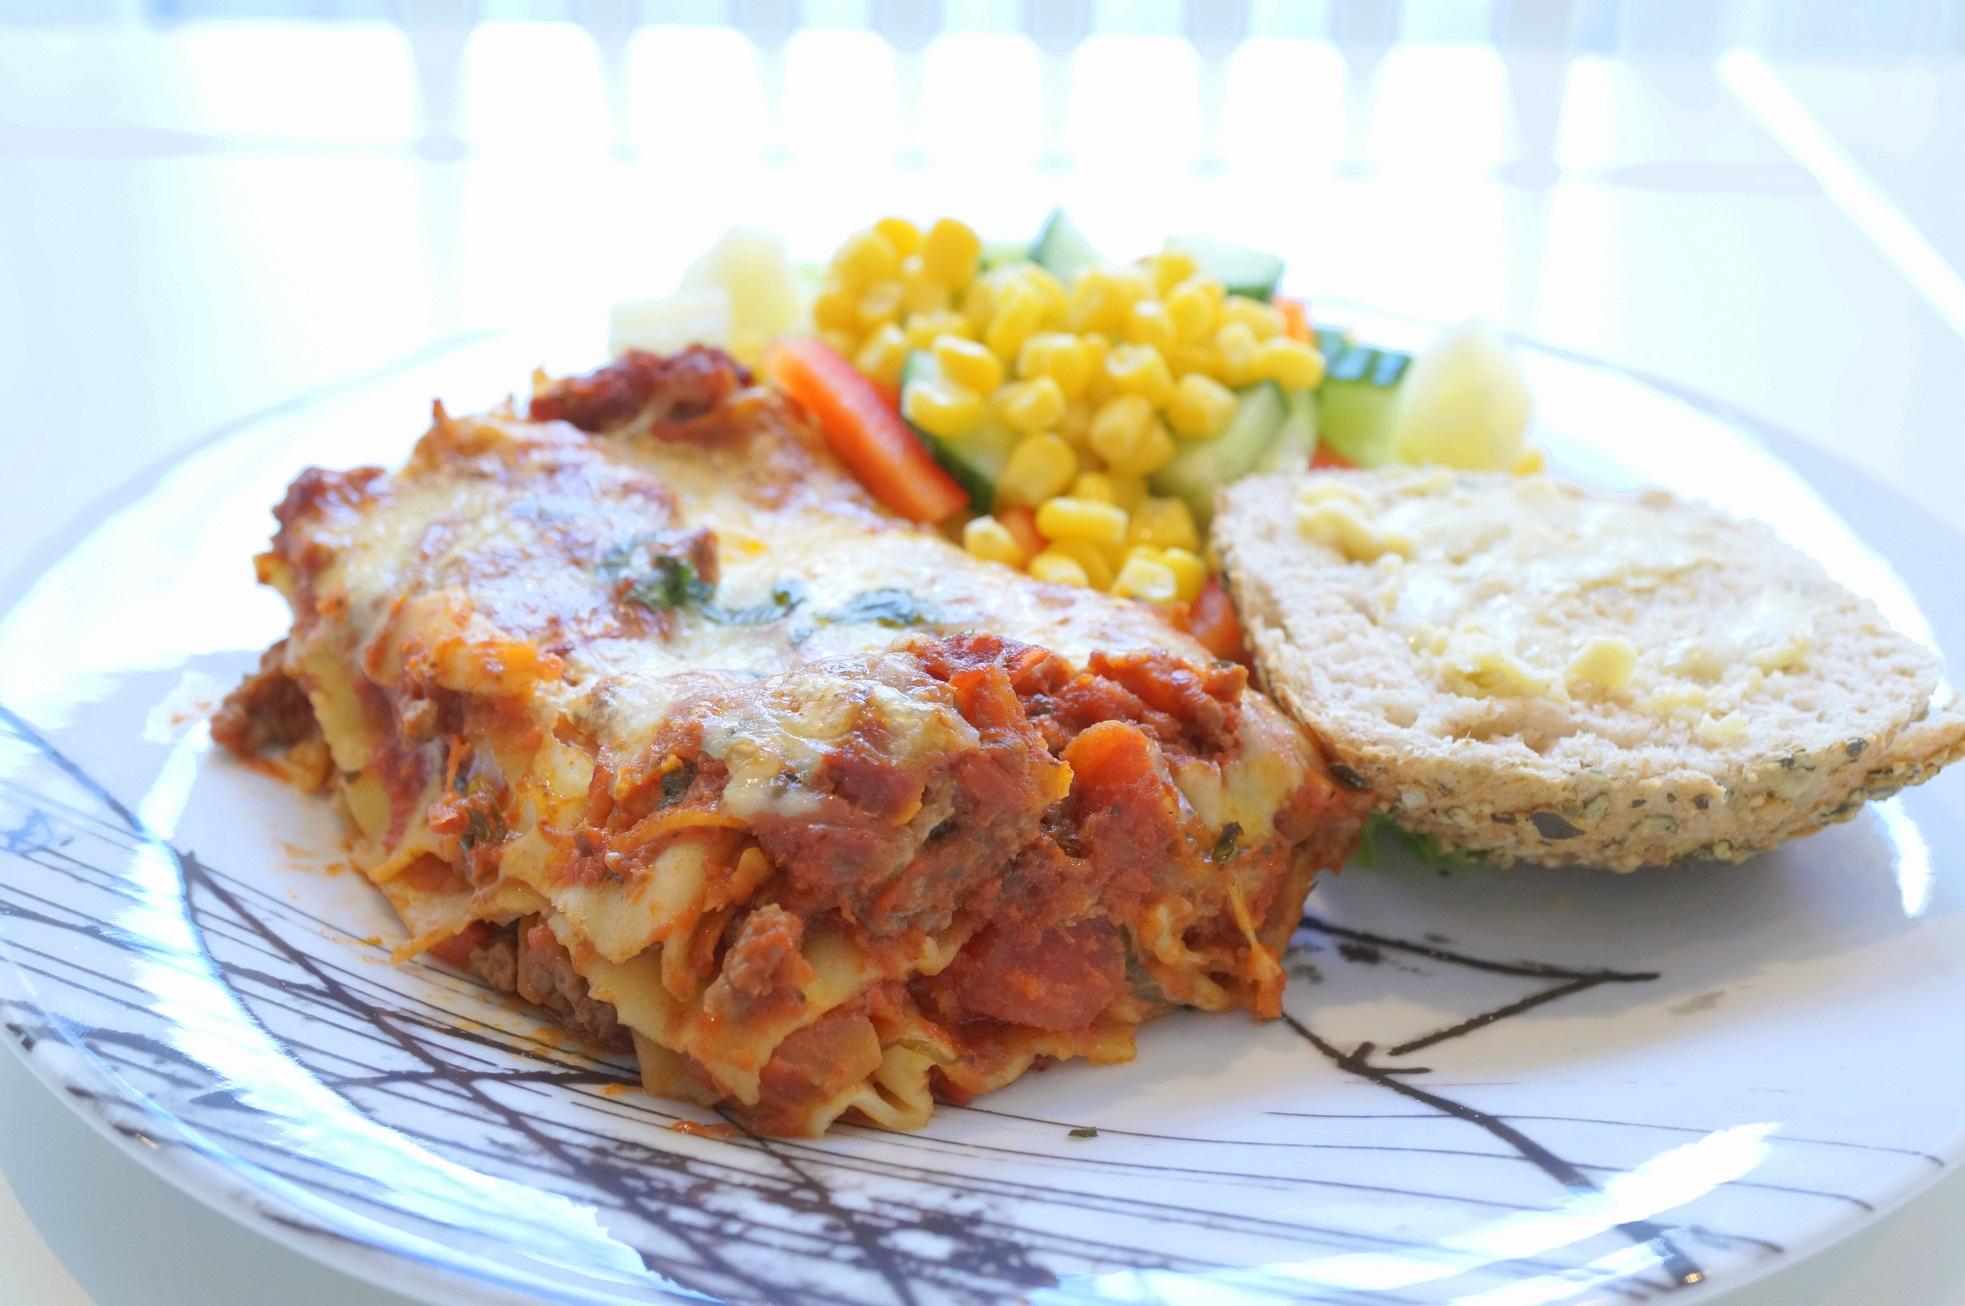 verdens beste hjemmelaget lasagne